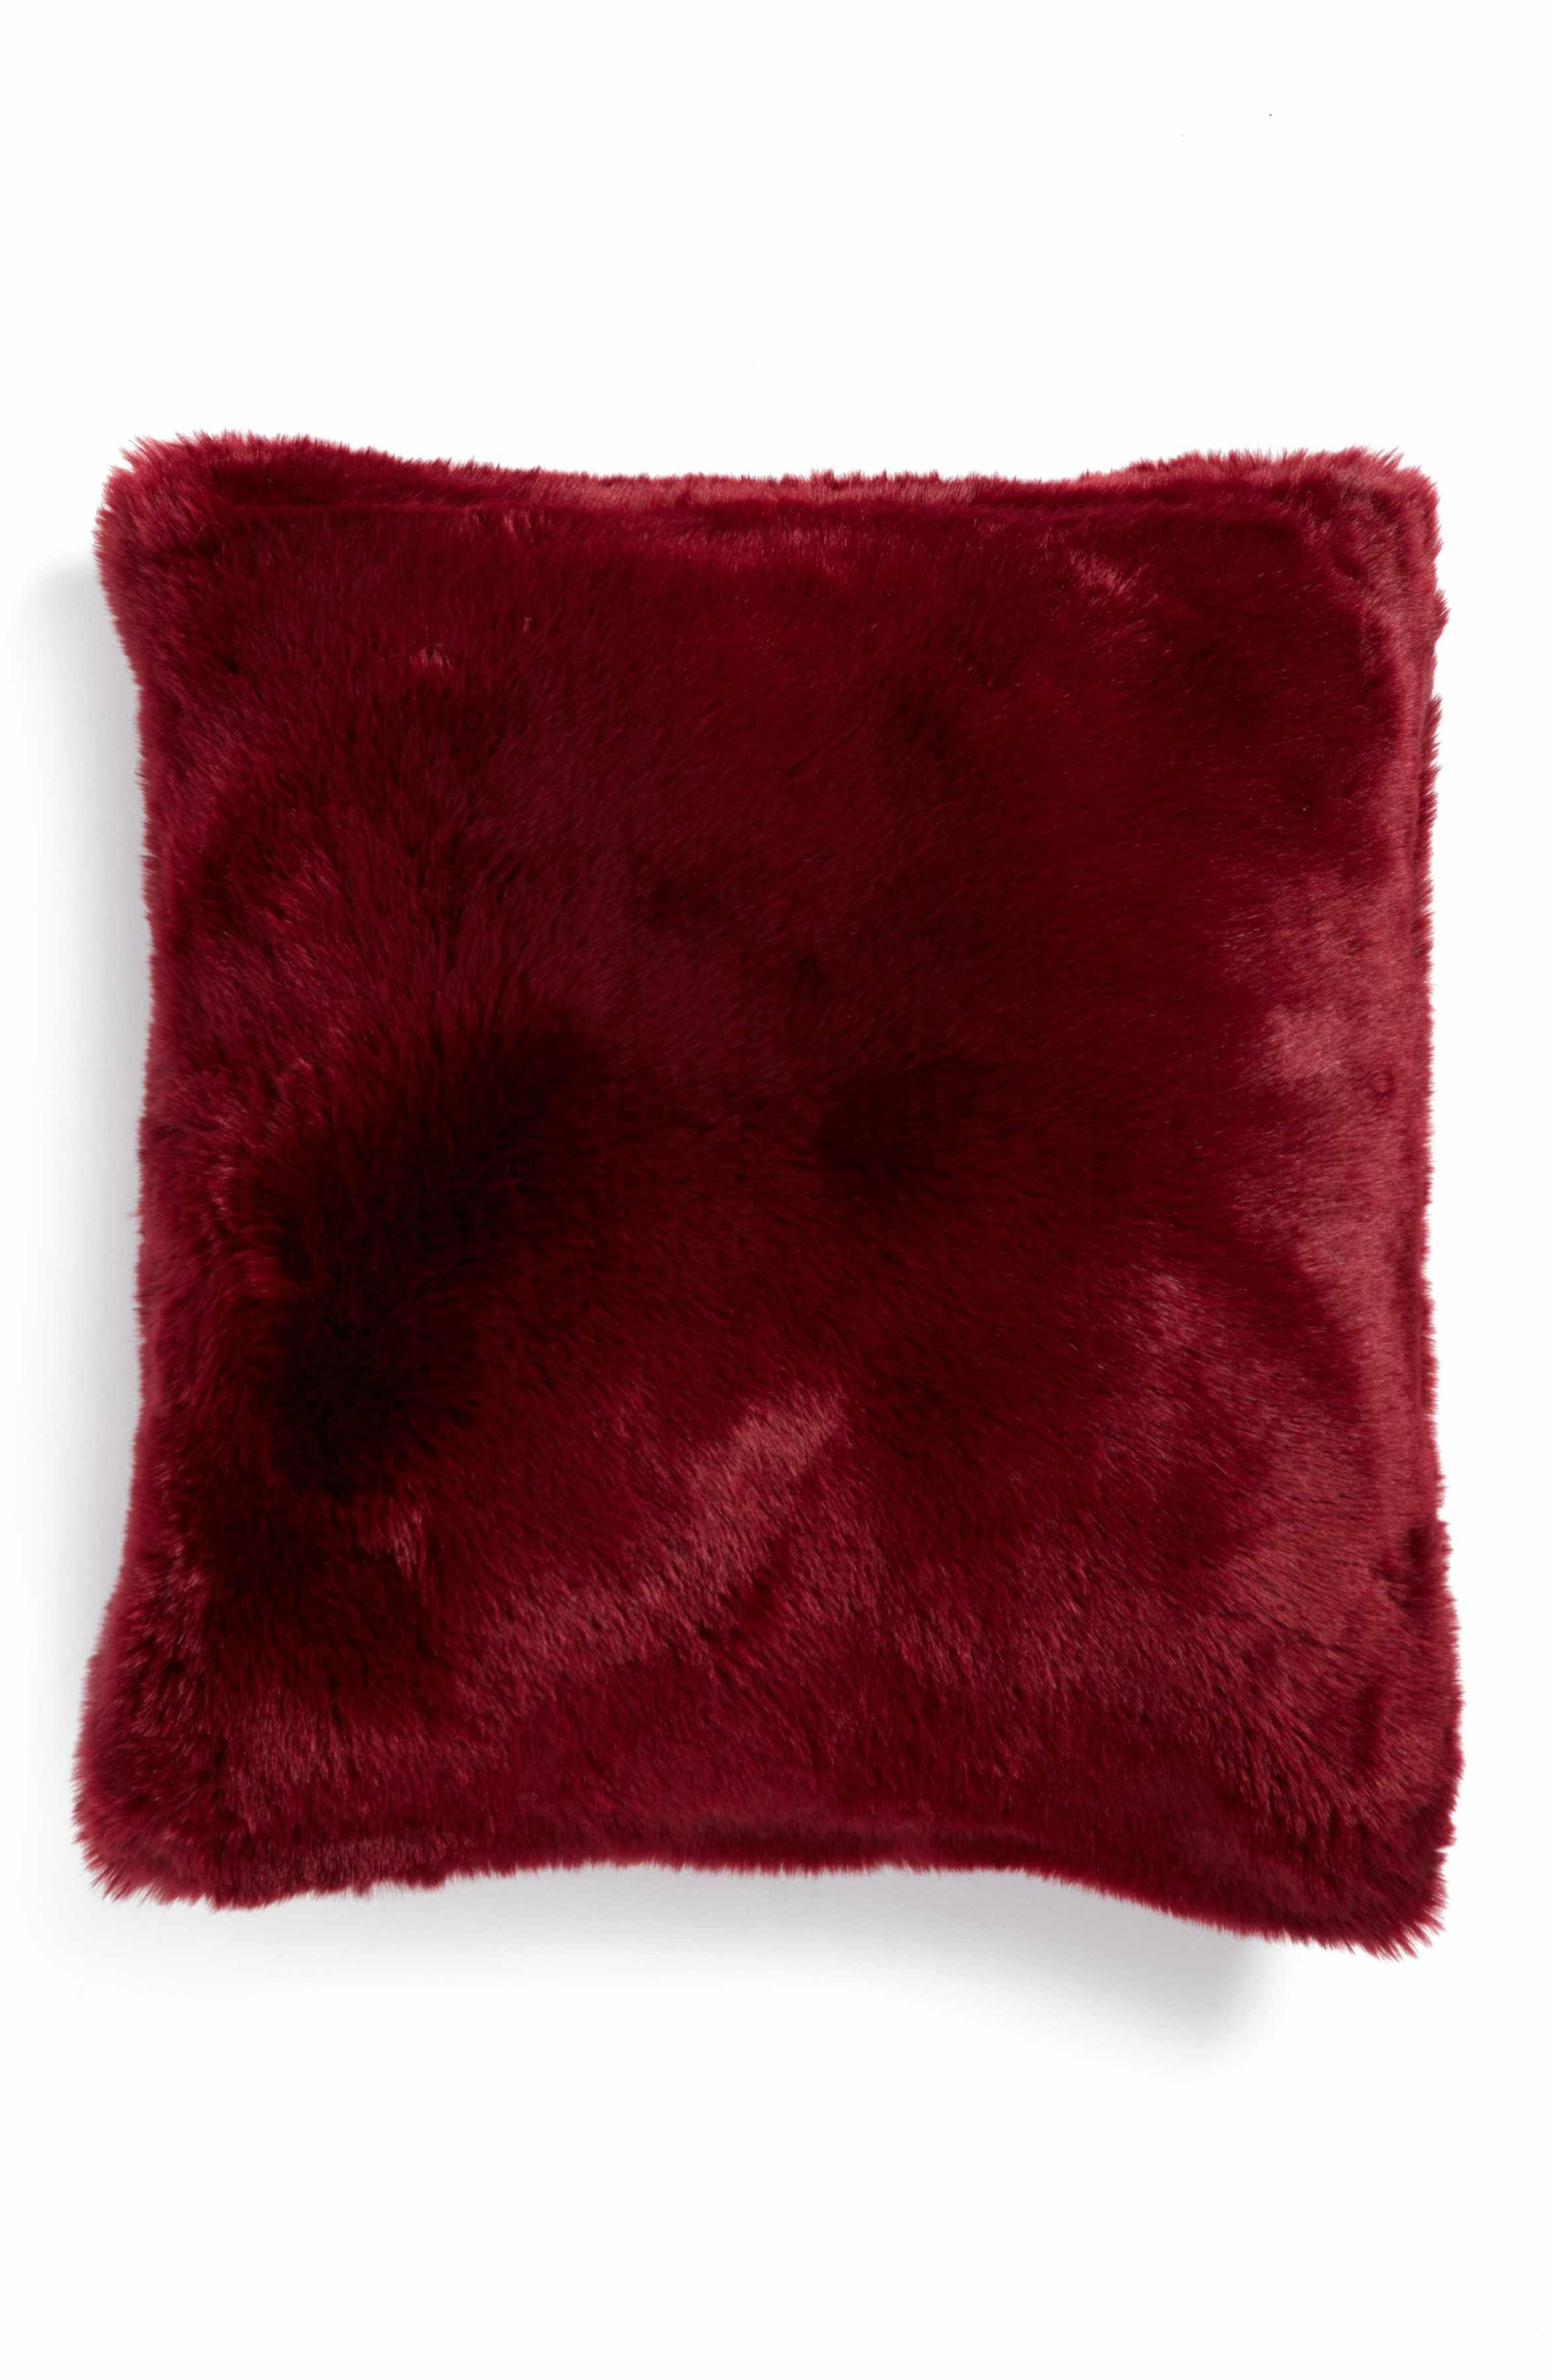 Cuddle Up Faux Fur Pillow | Cuddling, Fur pillow and Fur